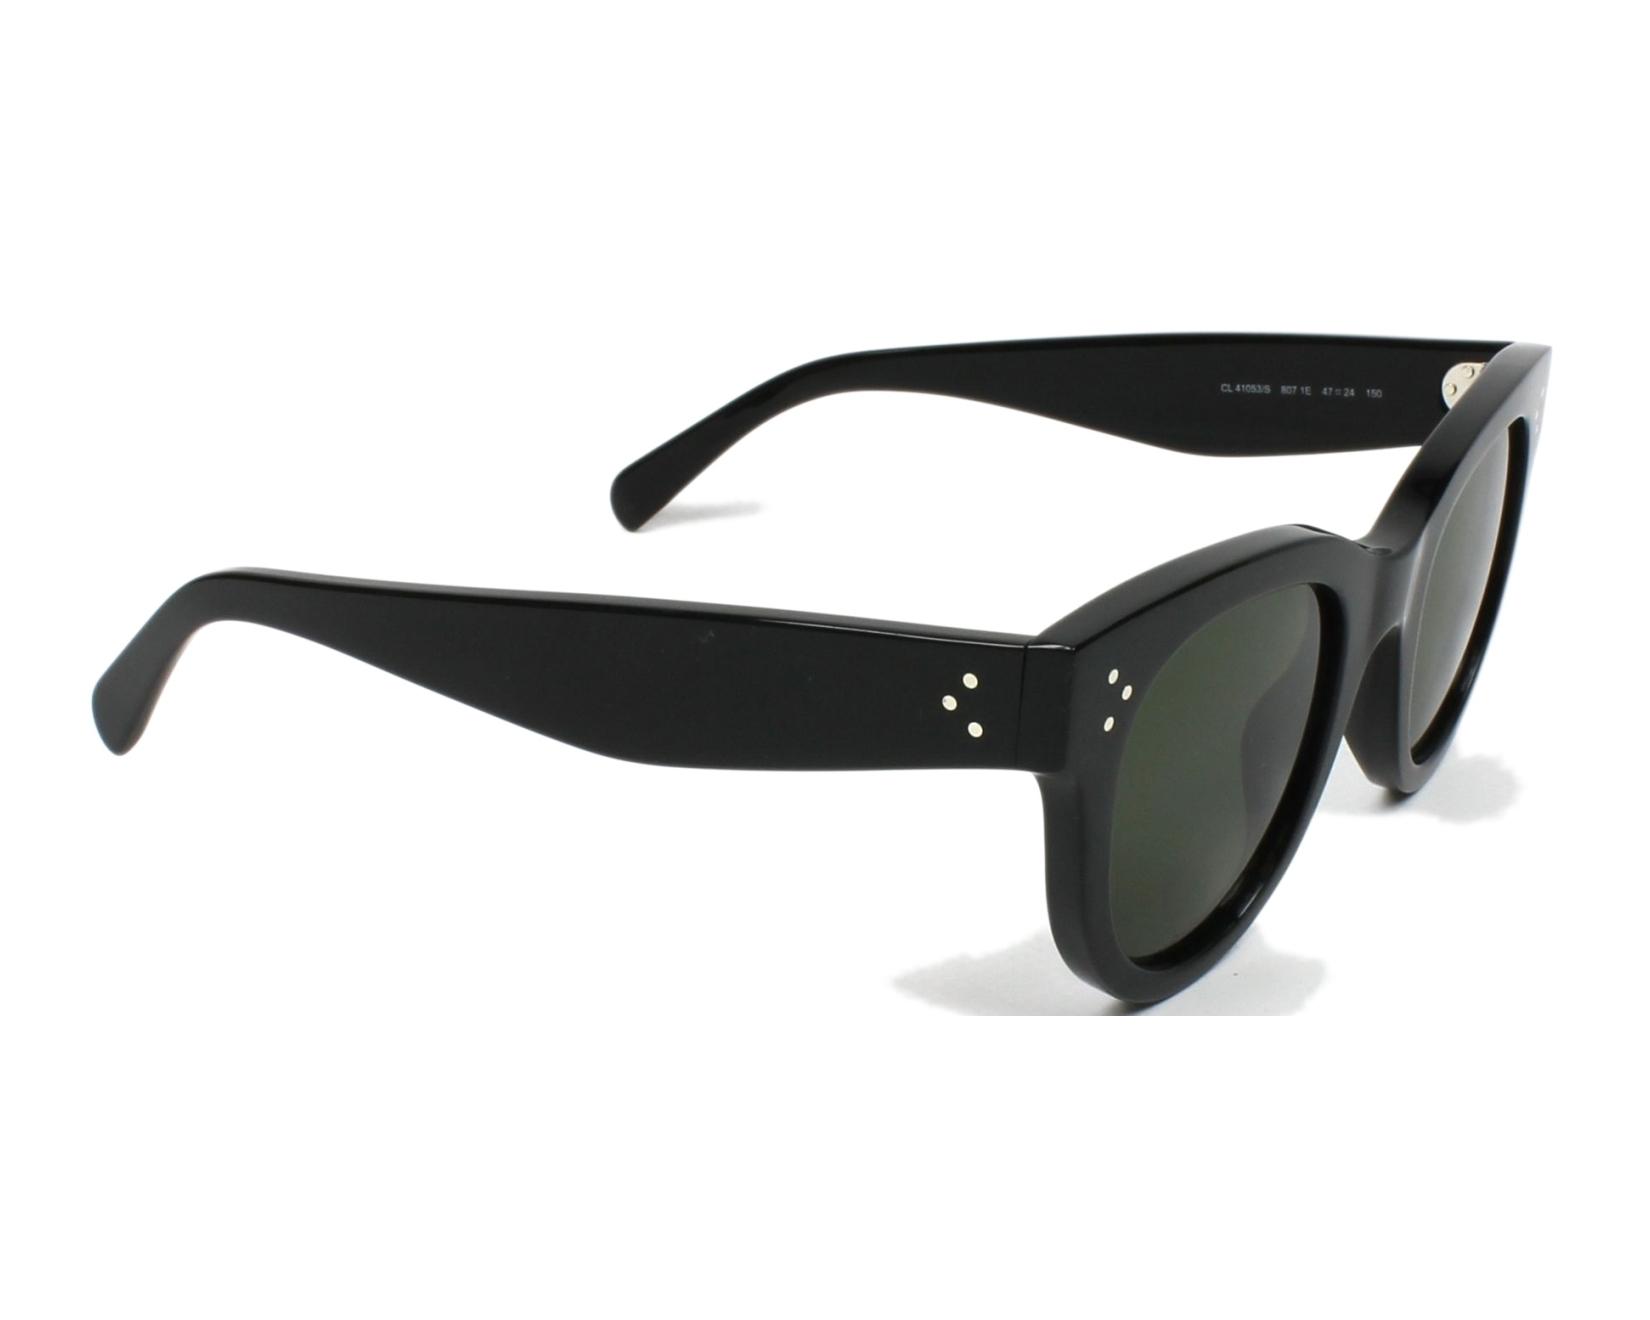 3bb93b7223 thumbnail Sunglasses Céline CL-41053-S 807 1E - Black side view